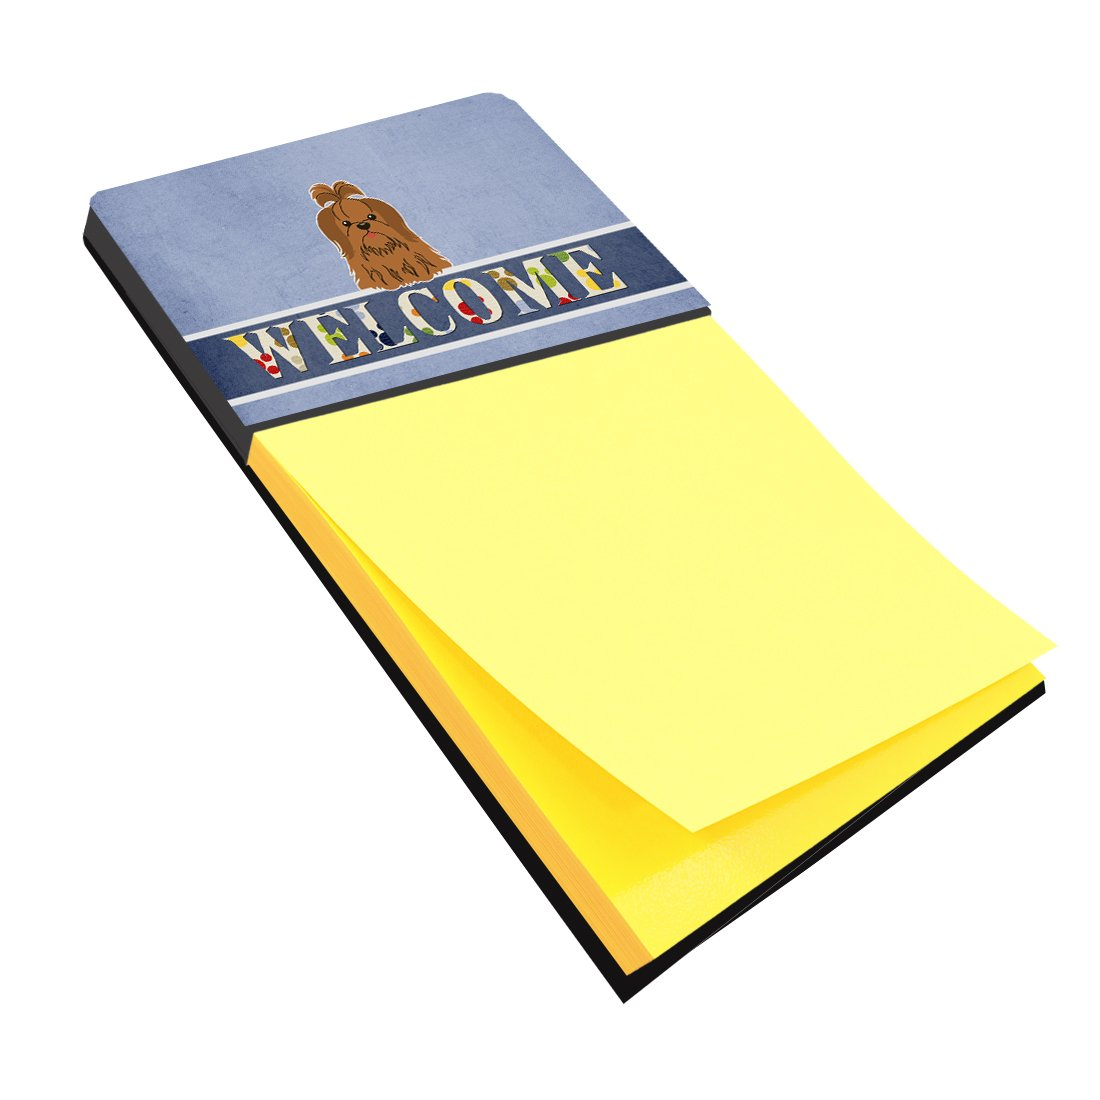 Exaclair FAF Deskside Pad Refill-Blank Small 1000 sheets